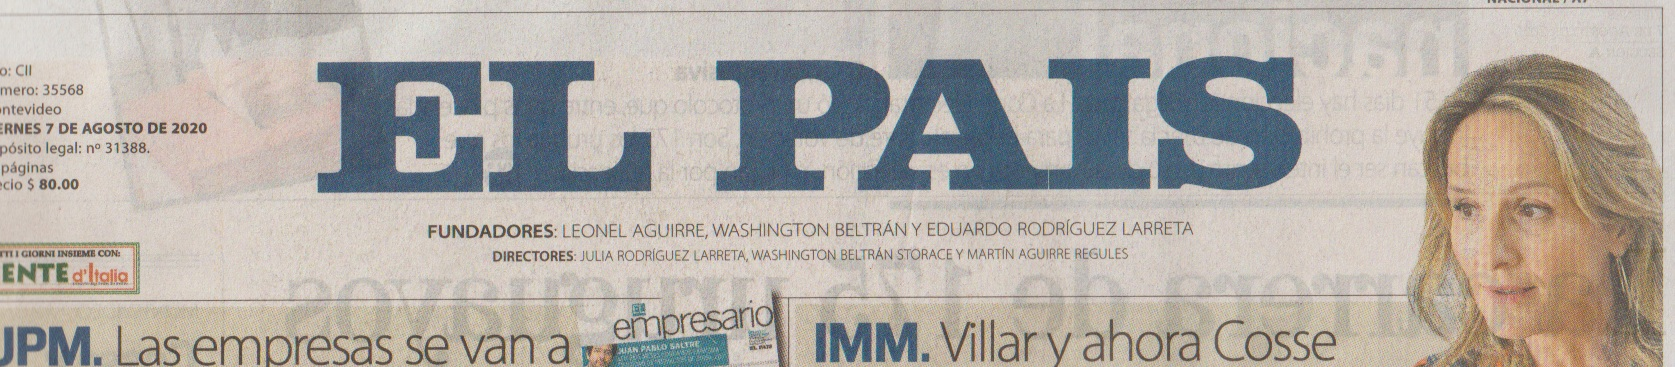 DIARIO EL PAIS 07-8 (PORTADA)